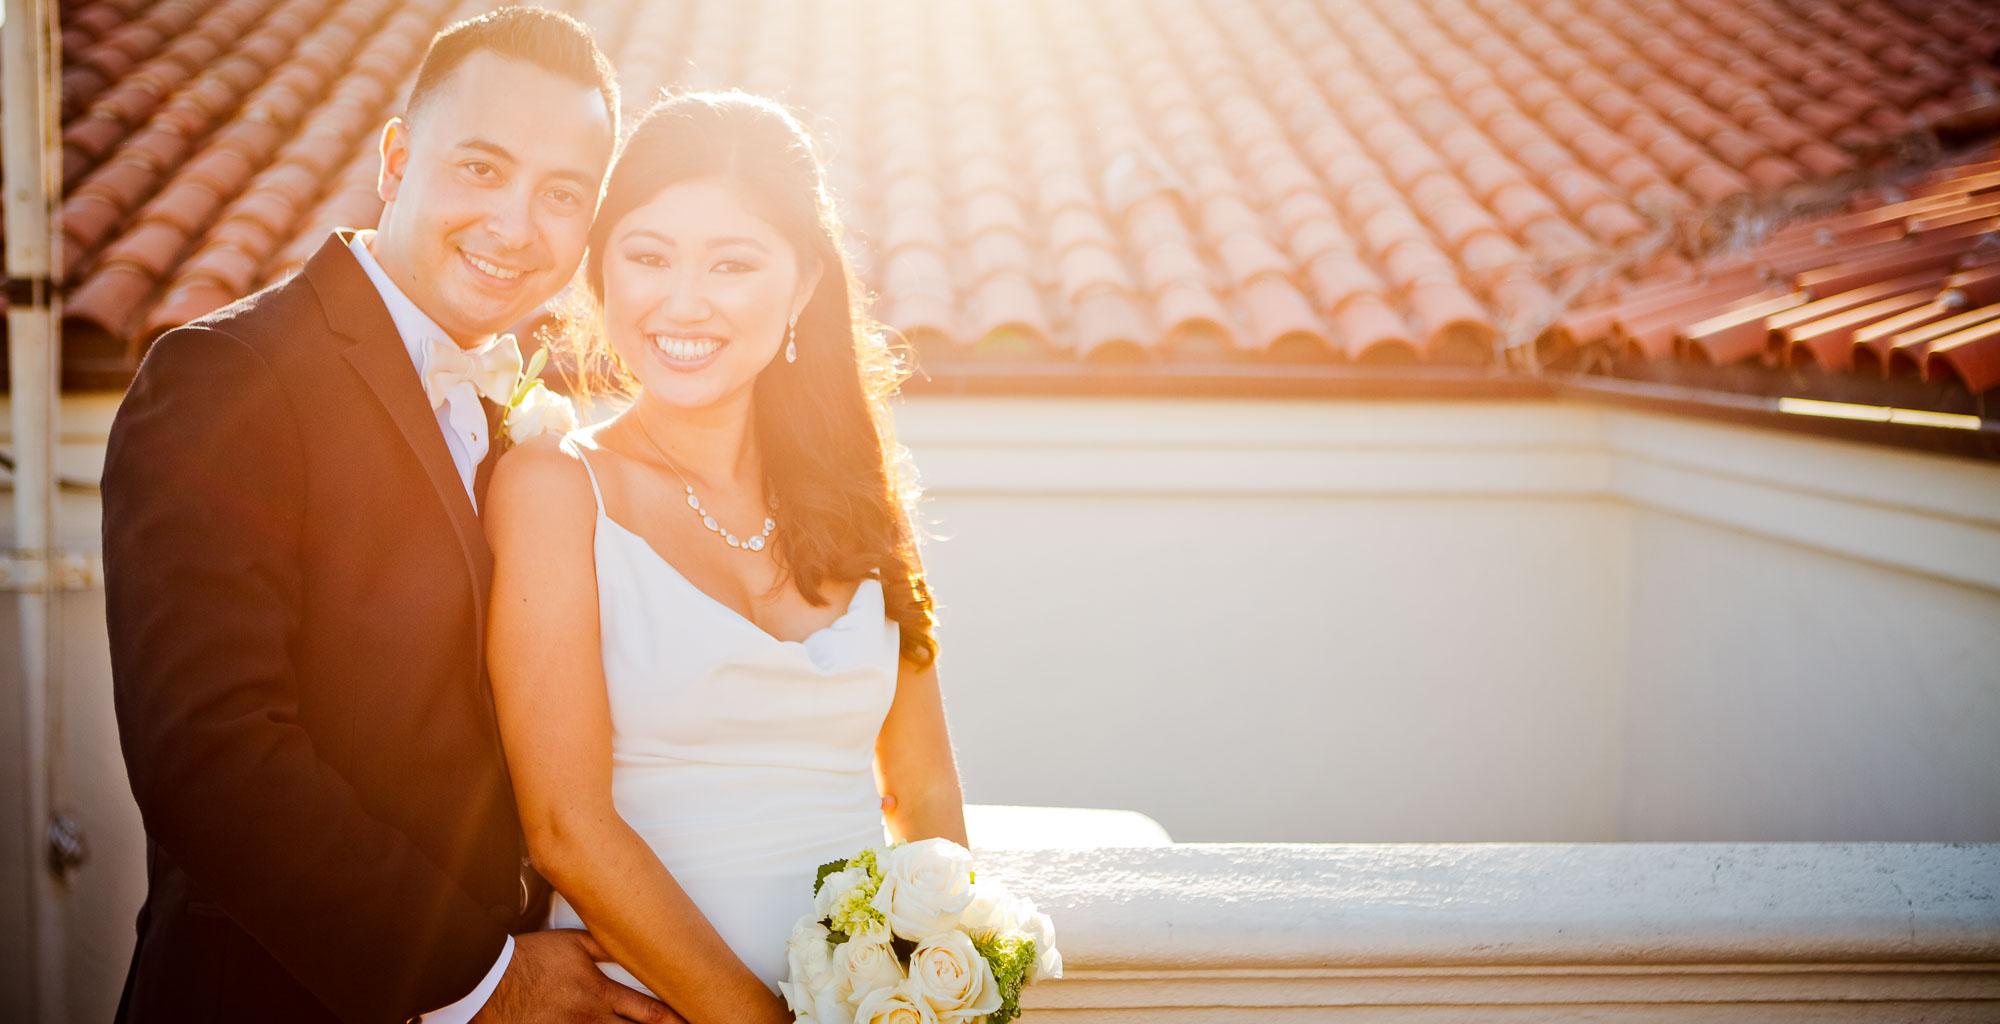 Sunny & Tony's Santa Barbara Wedding featured slider image